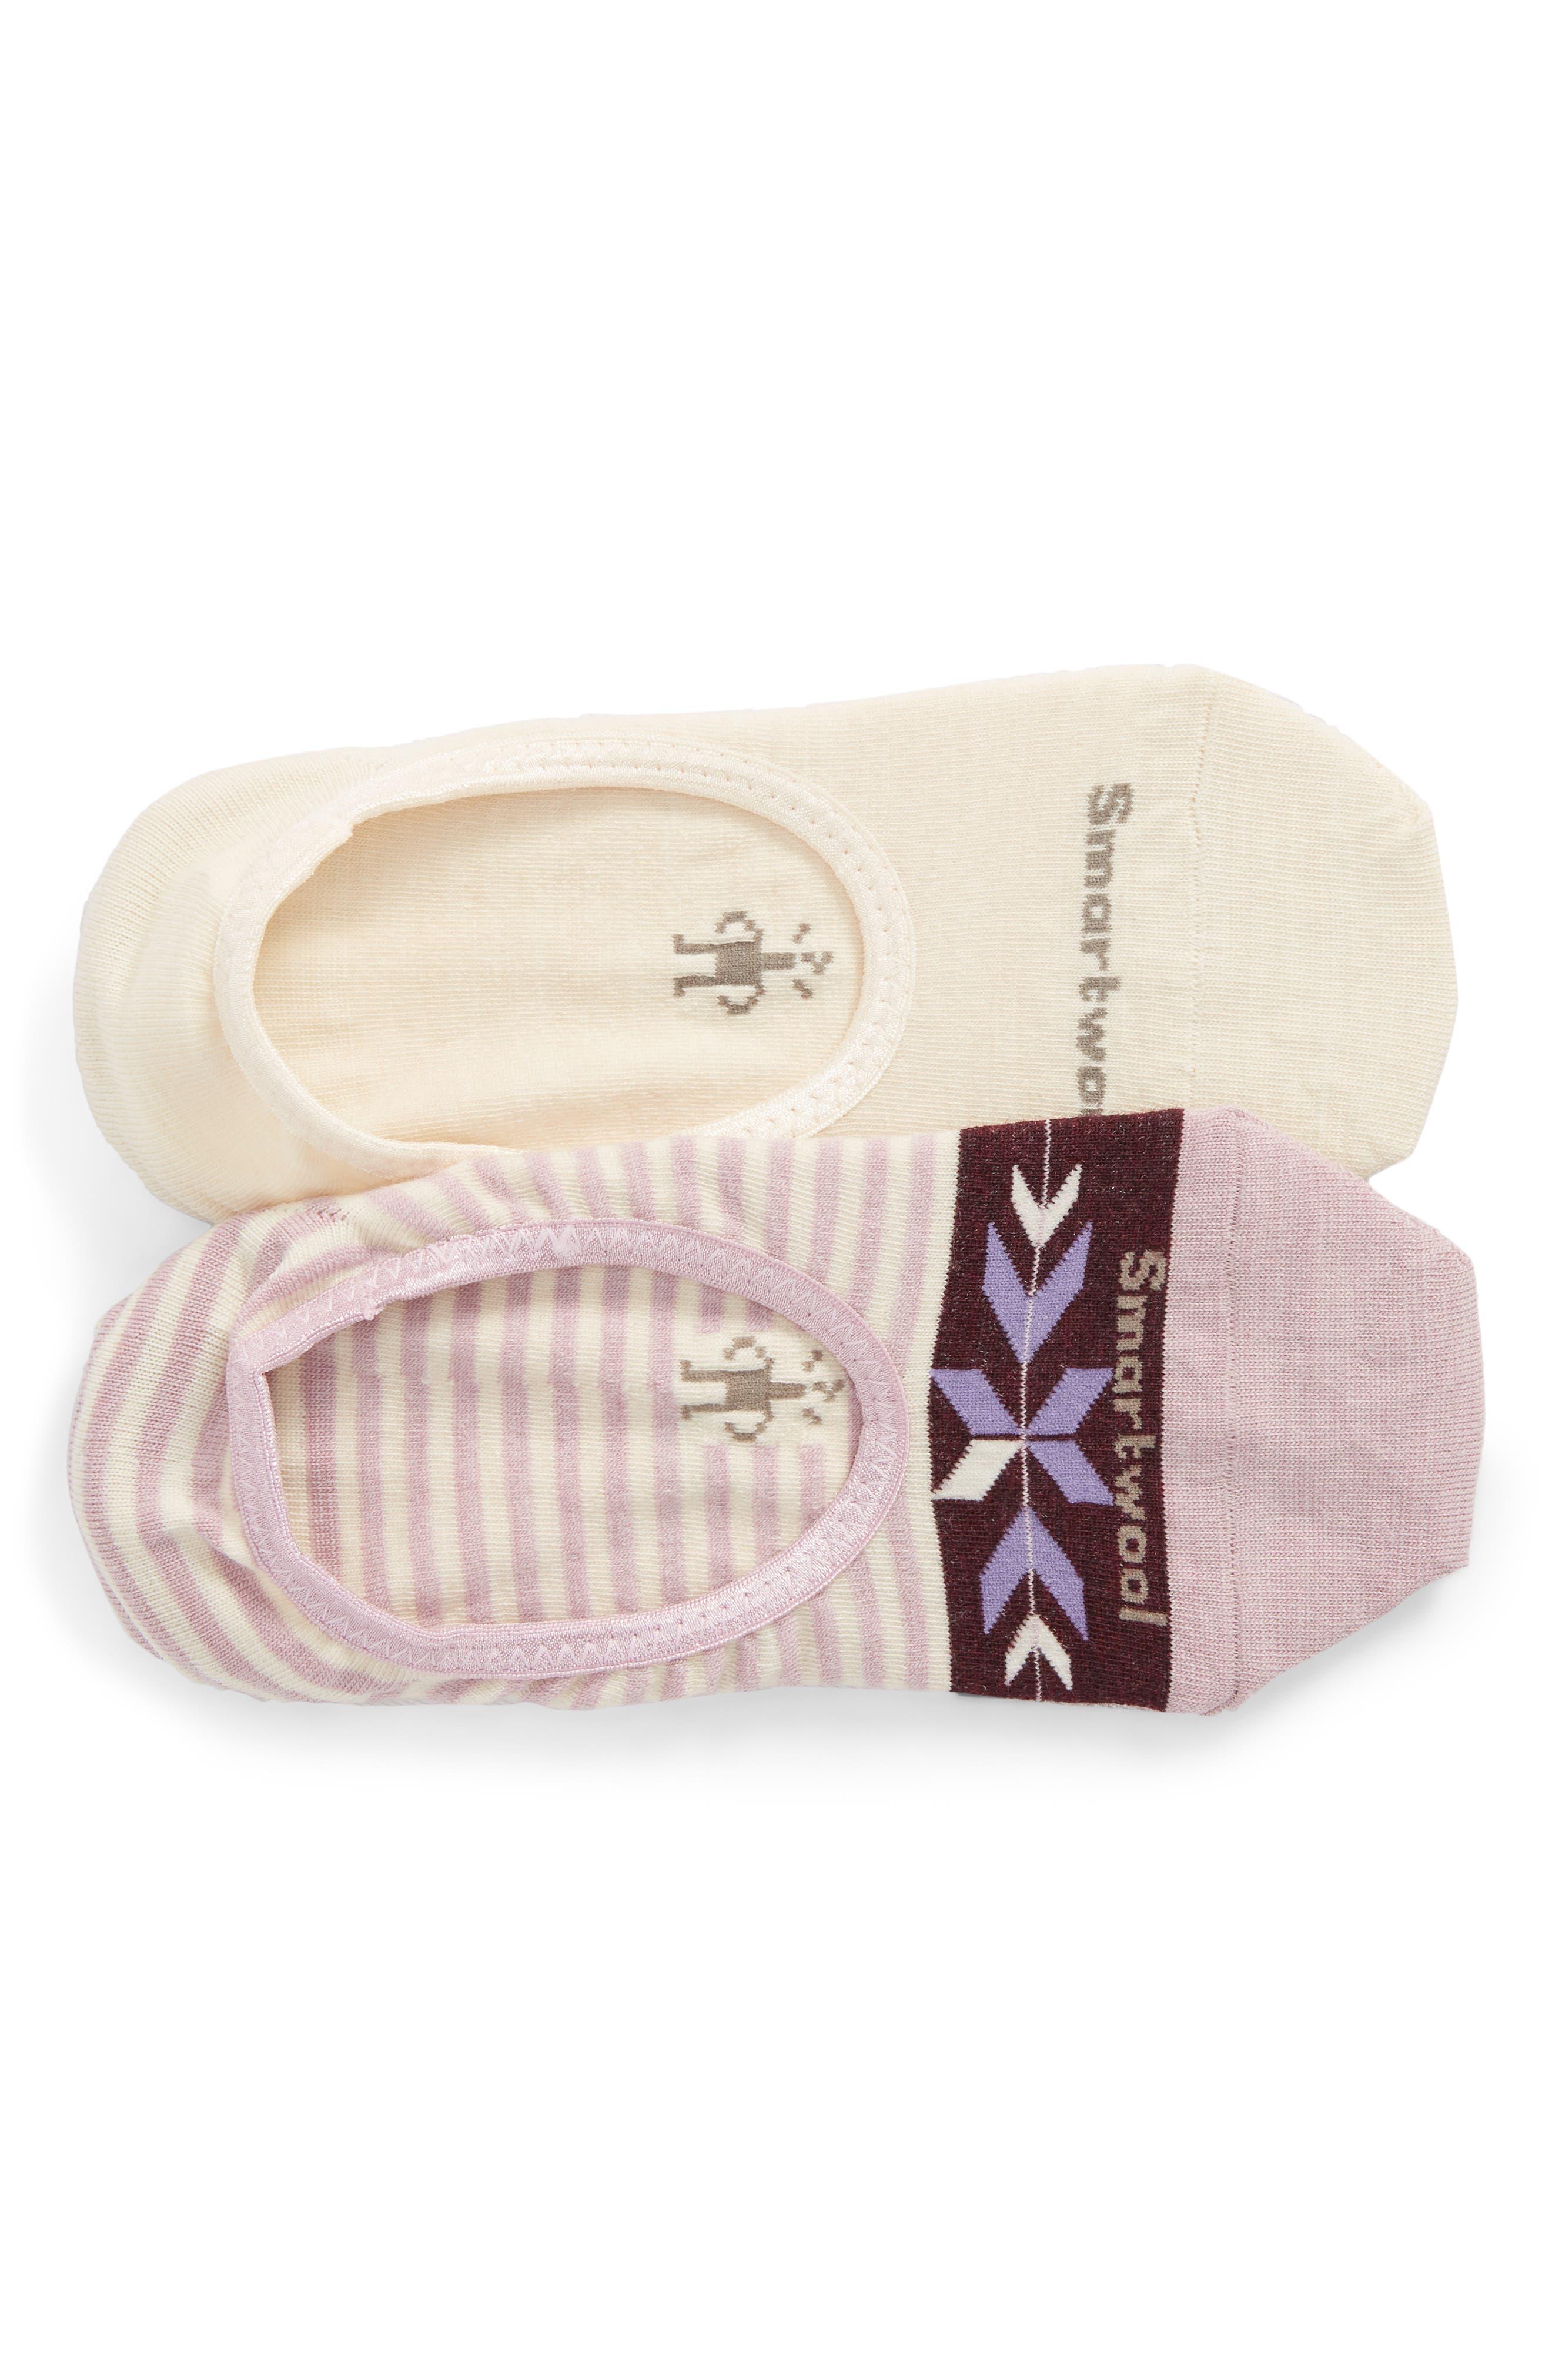 2-Pack Hide & Seek No-Show Socks,                         Main,                         color, Multi Color B